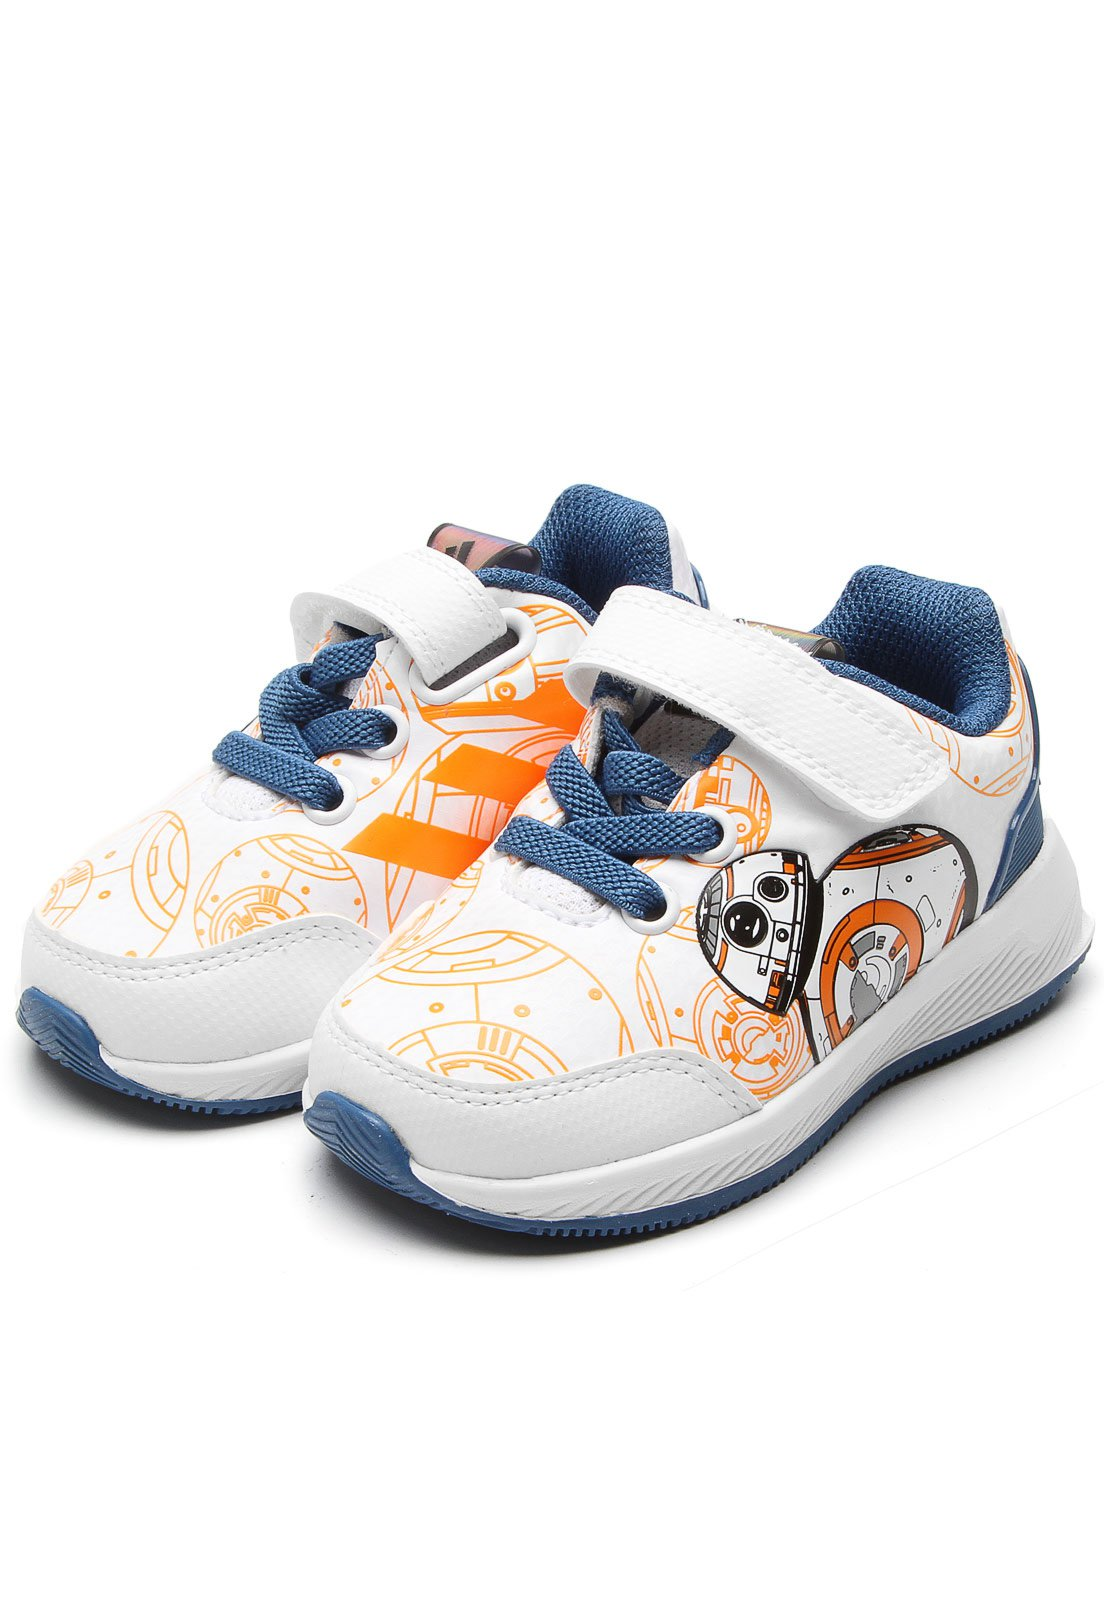 8908b35f813a2 Tênis adidas Star Wars Branco - Compre Agora